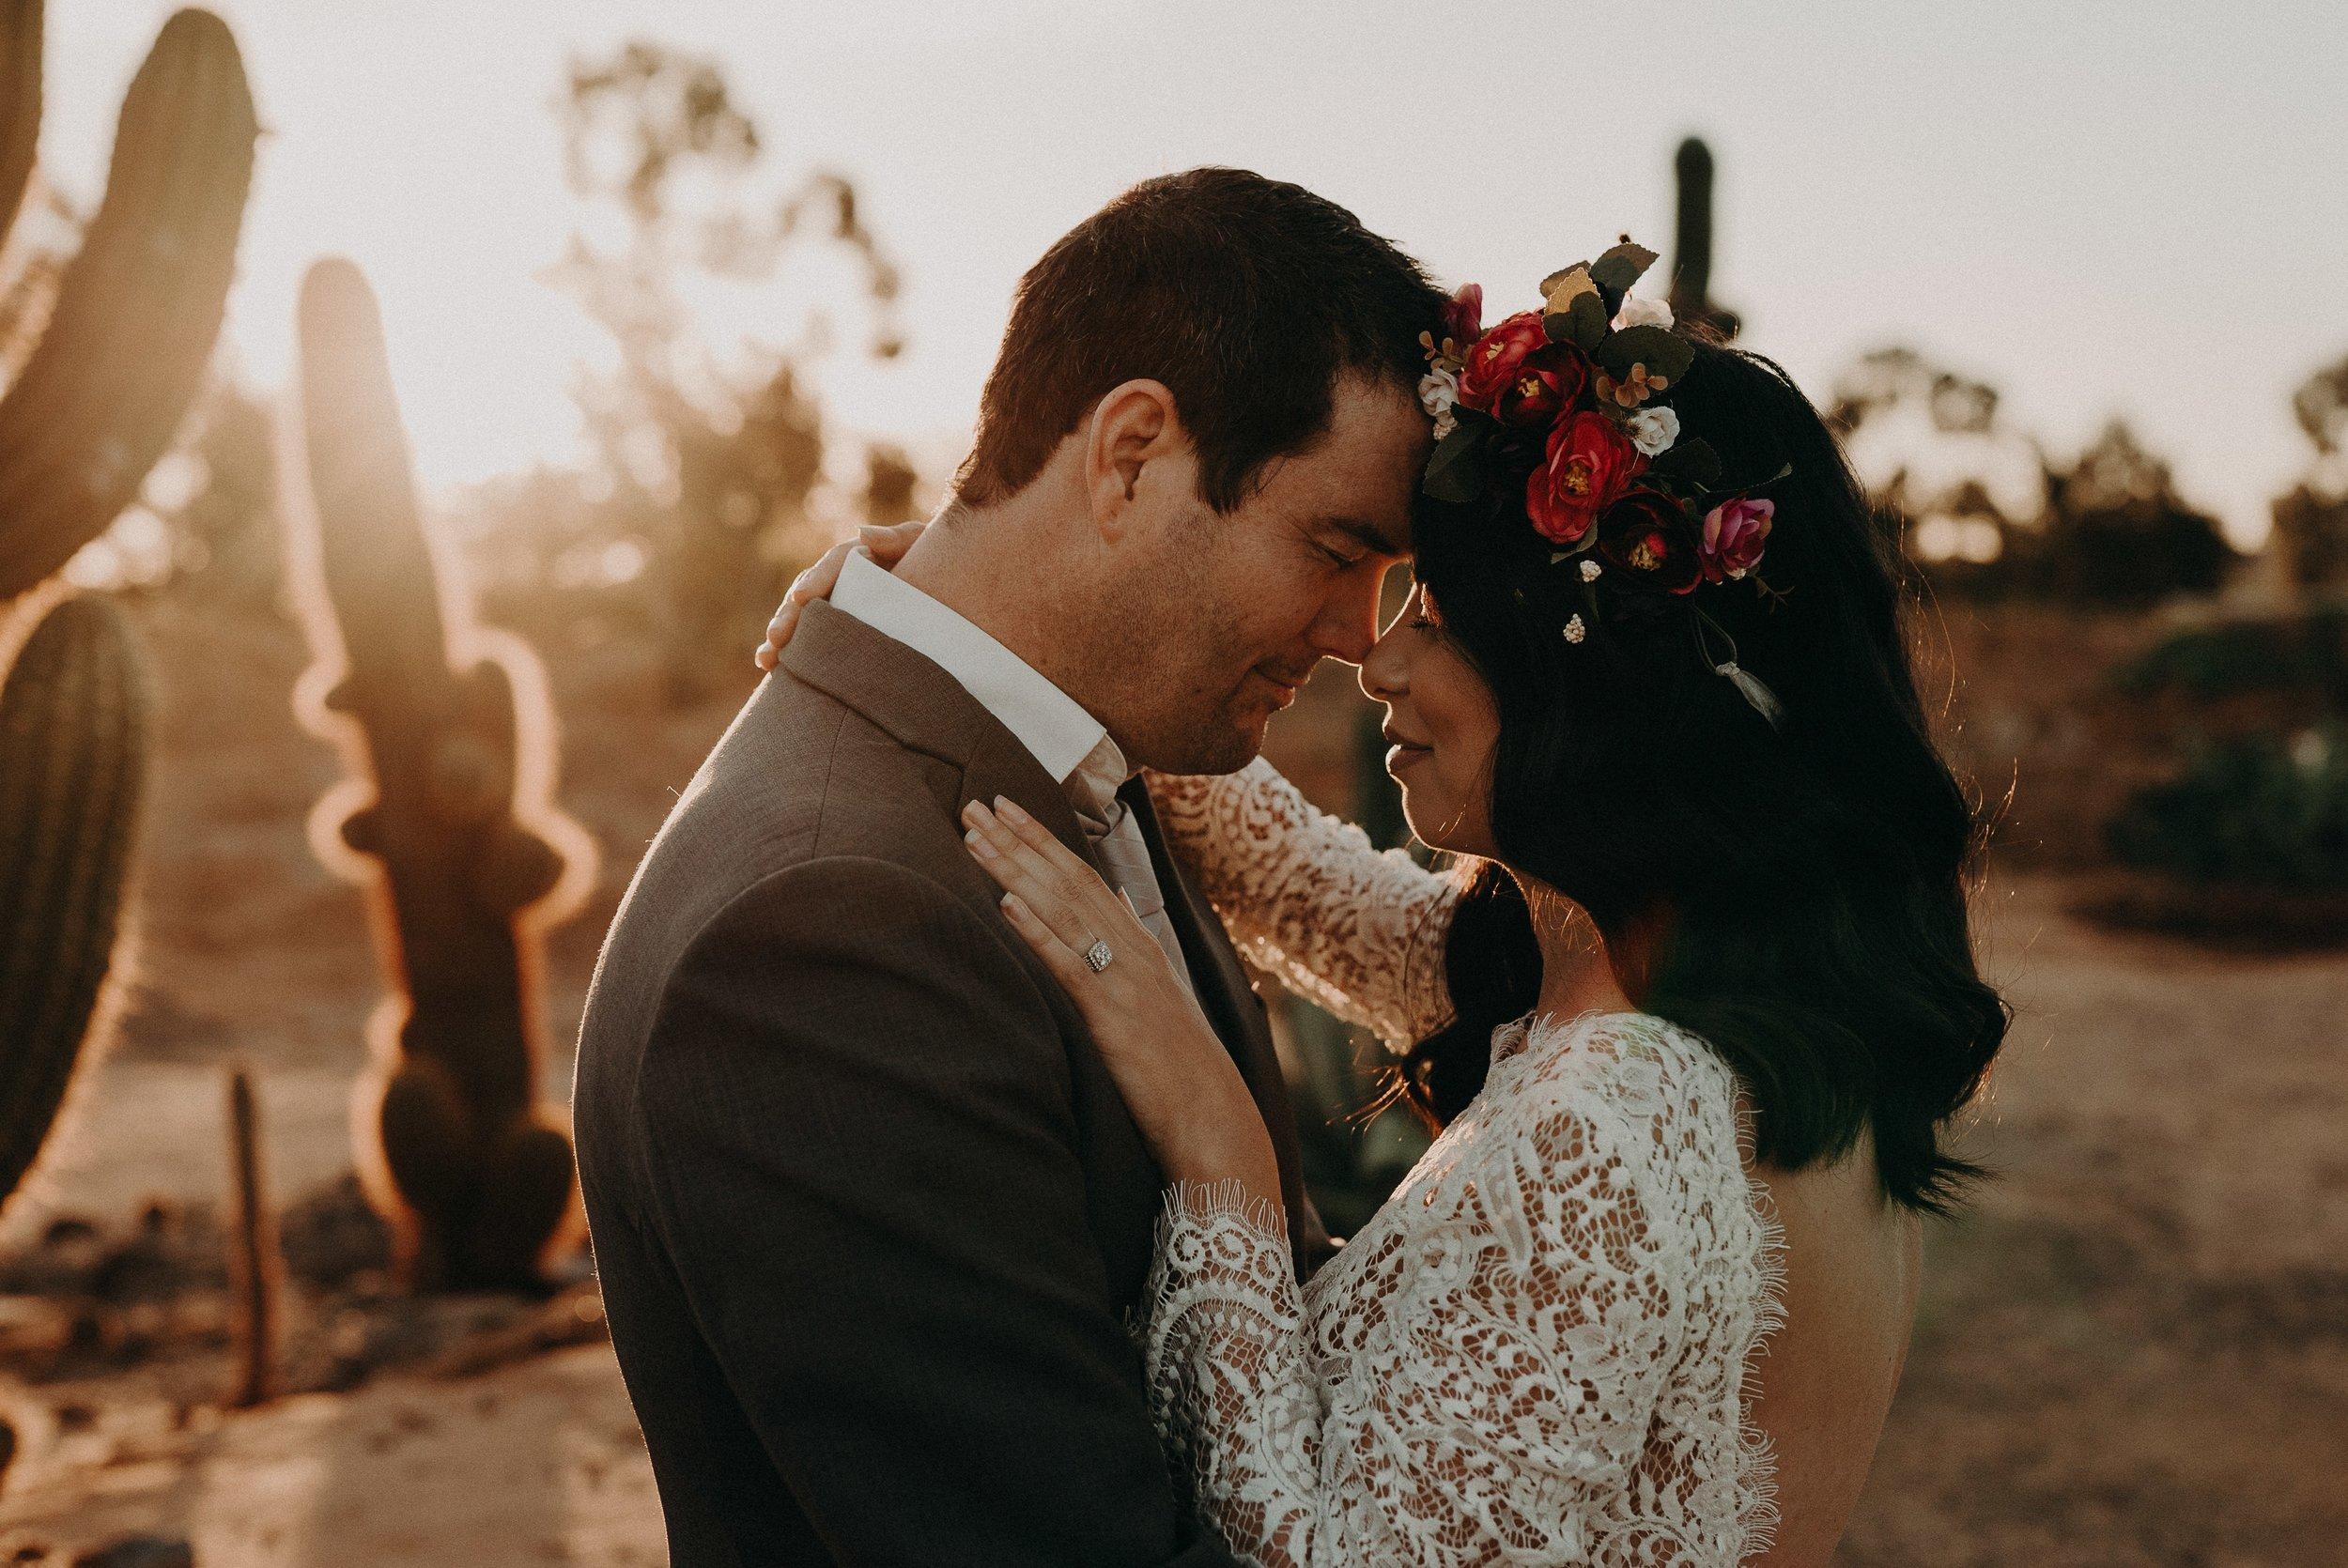 mickalathomas_puremacphotography_weddingphotographer_couplephotographer_Sheppartonphotographer_1459.jpg